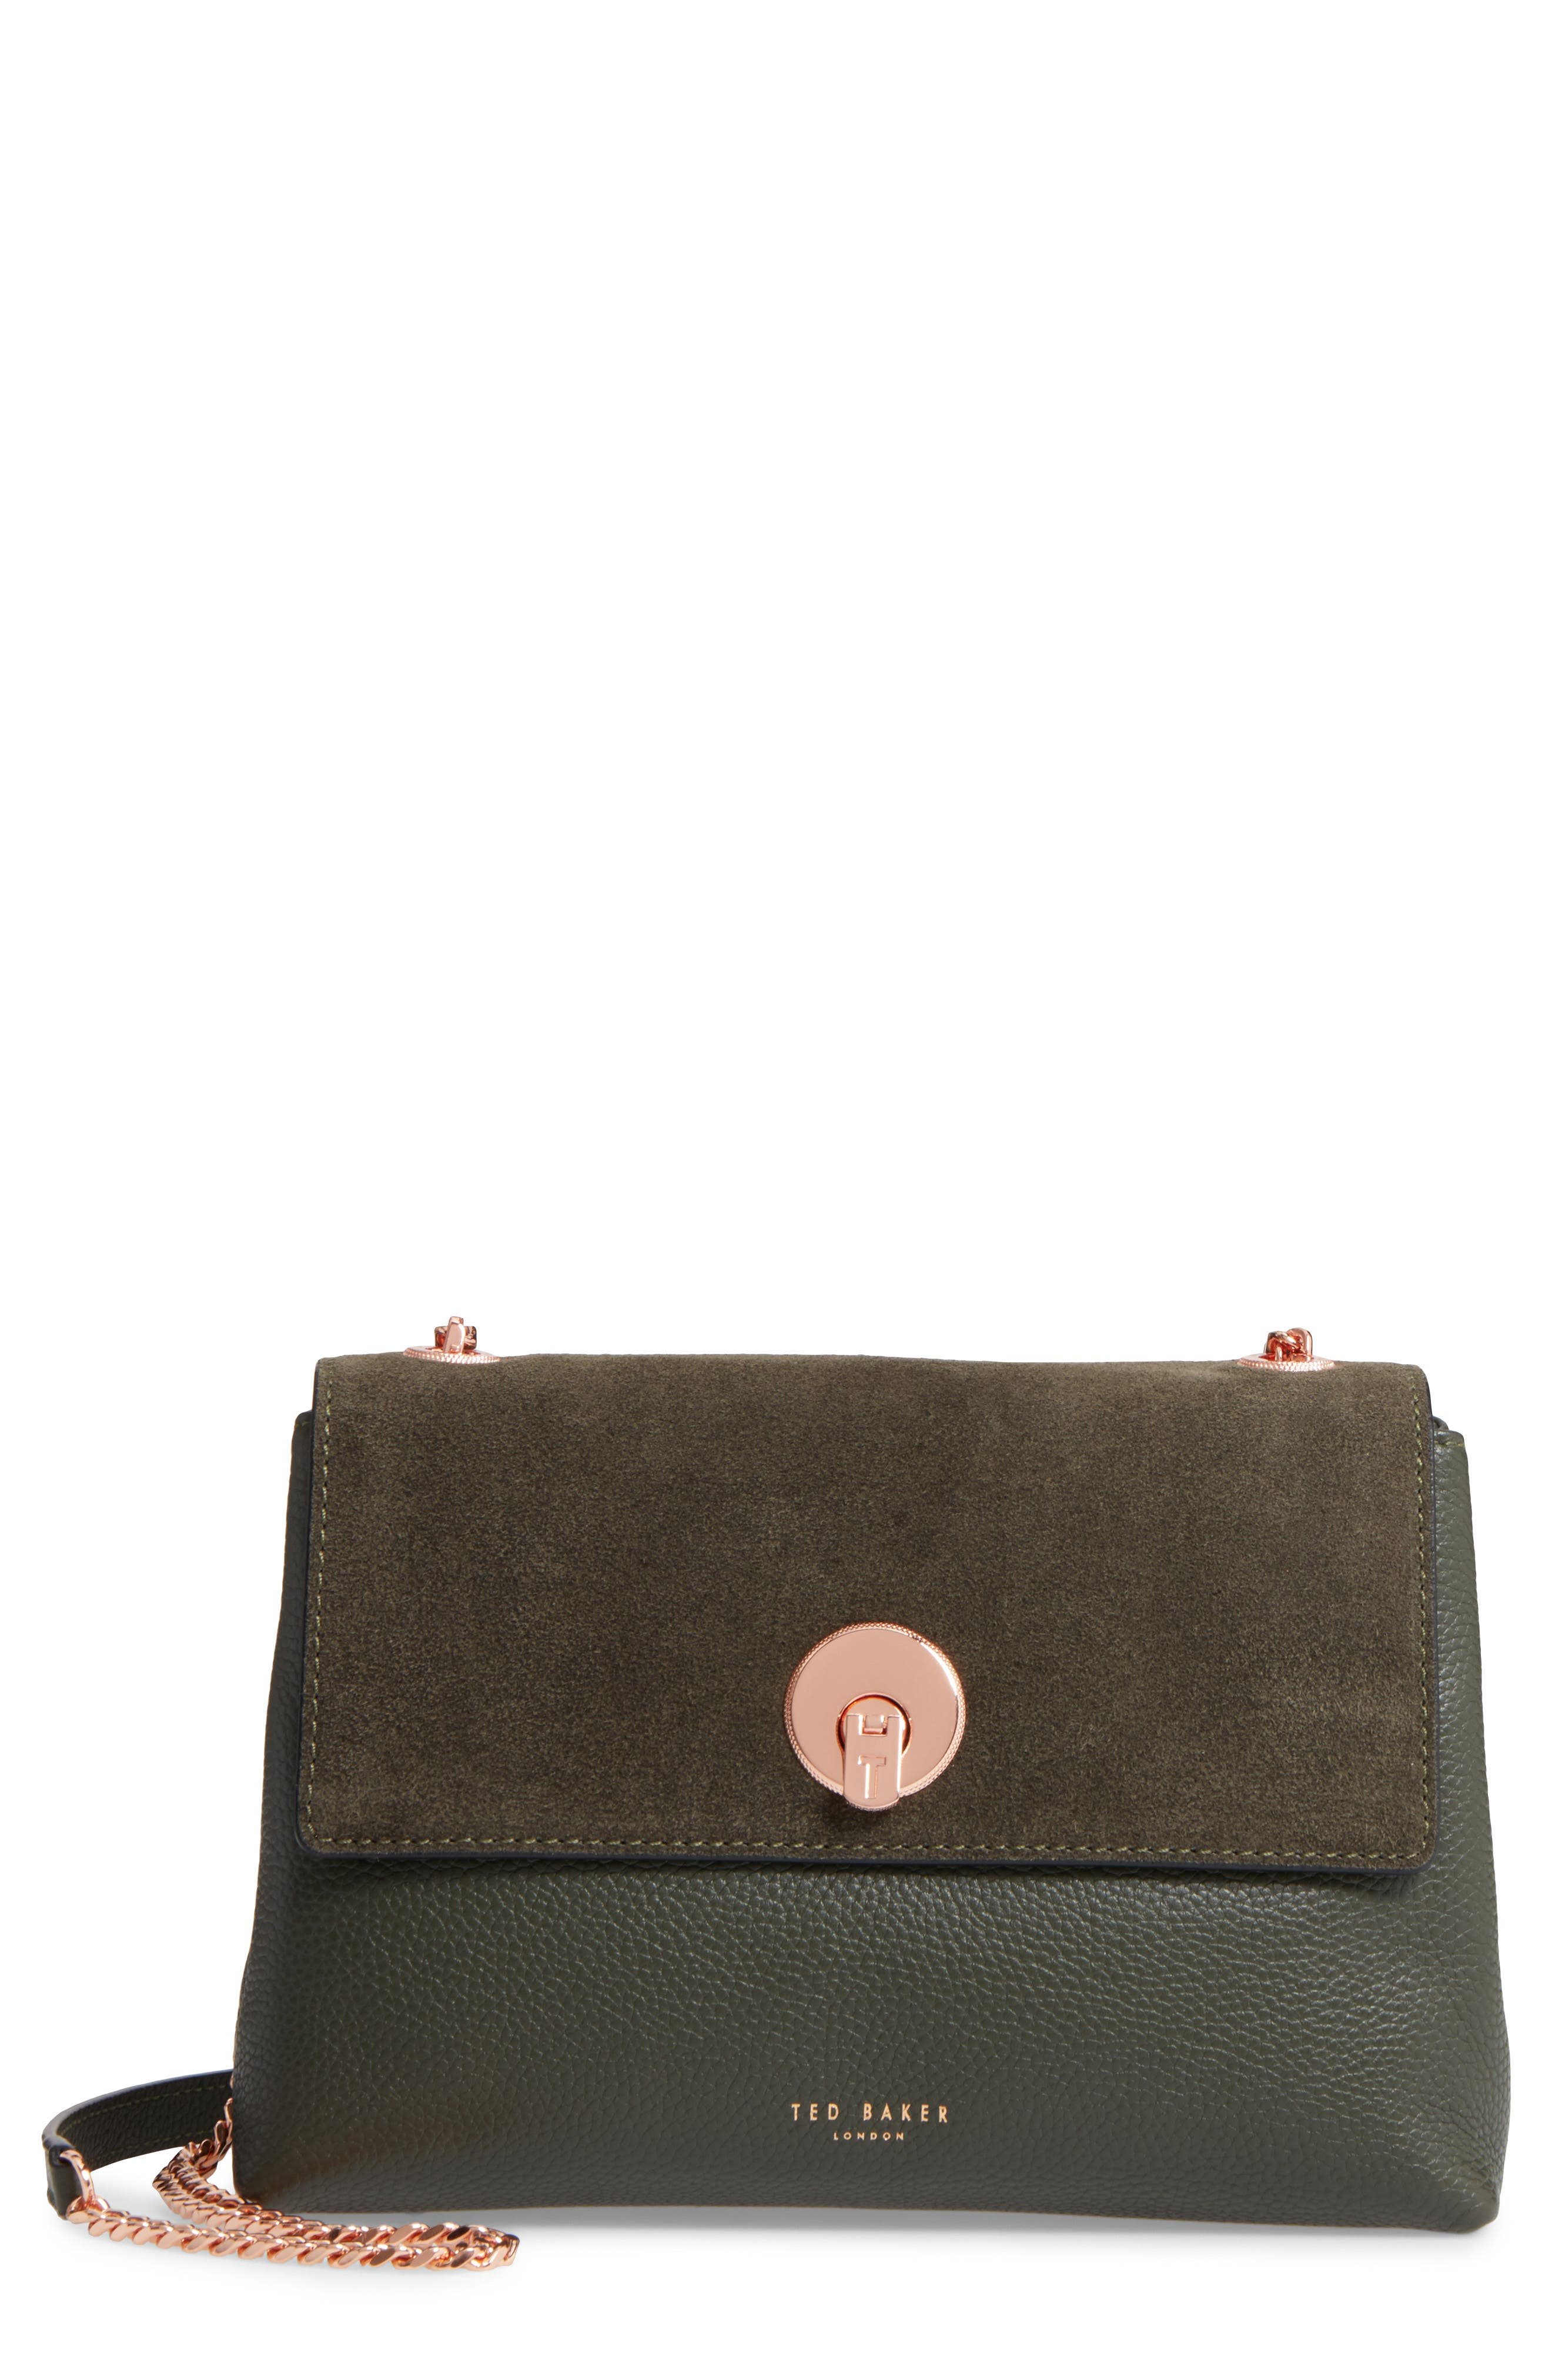 Main Image - Ted Baker London Sorikai Leather & Suede Crossbody Bag